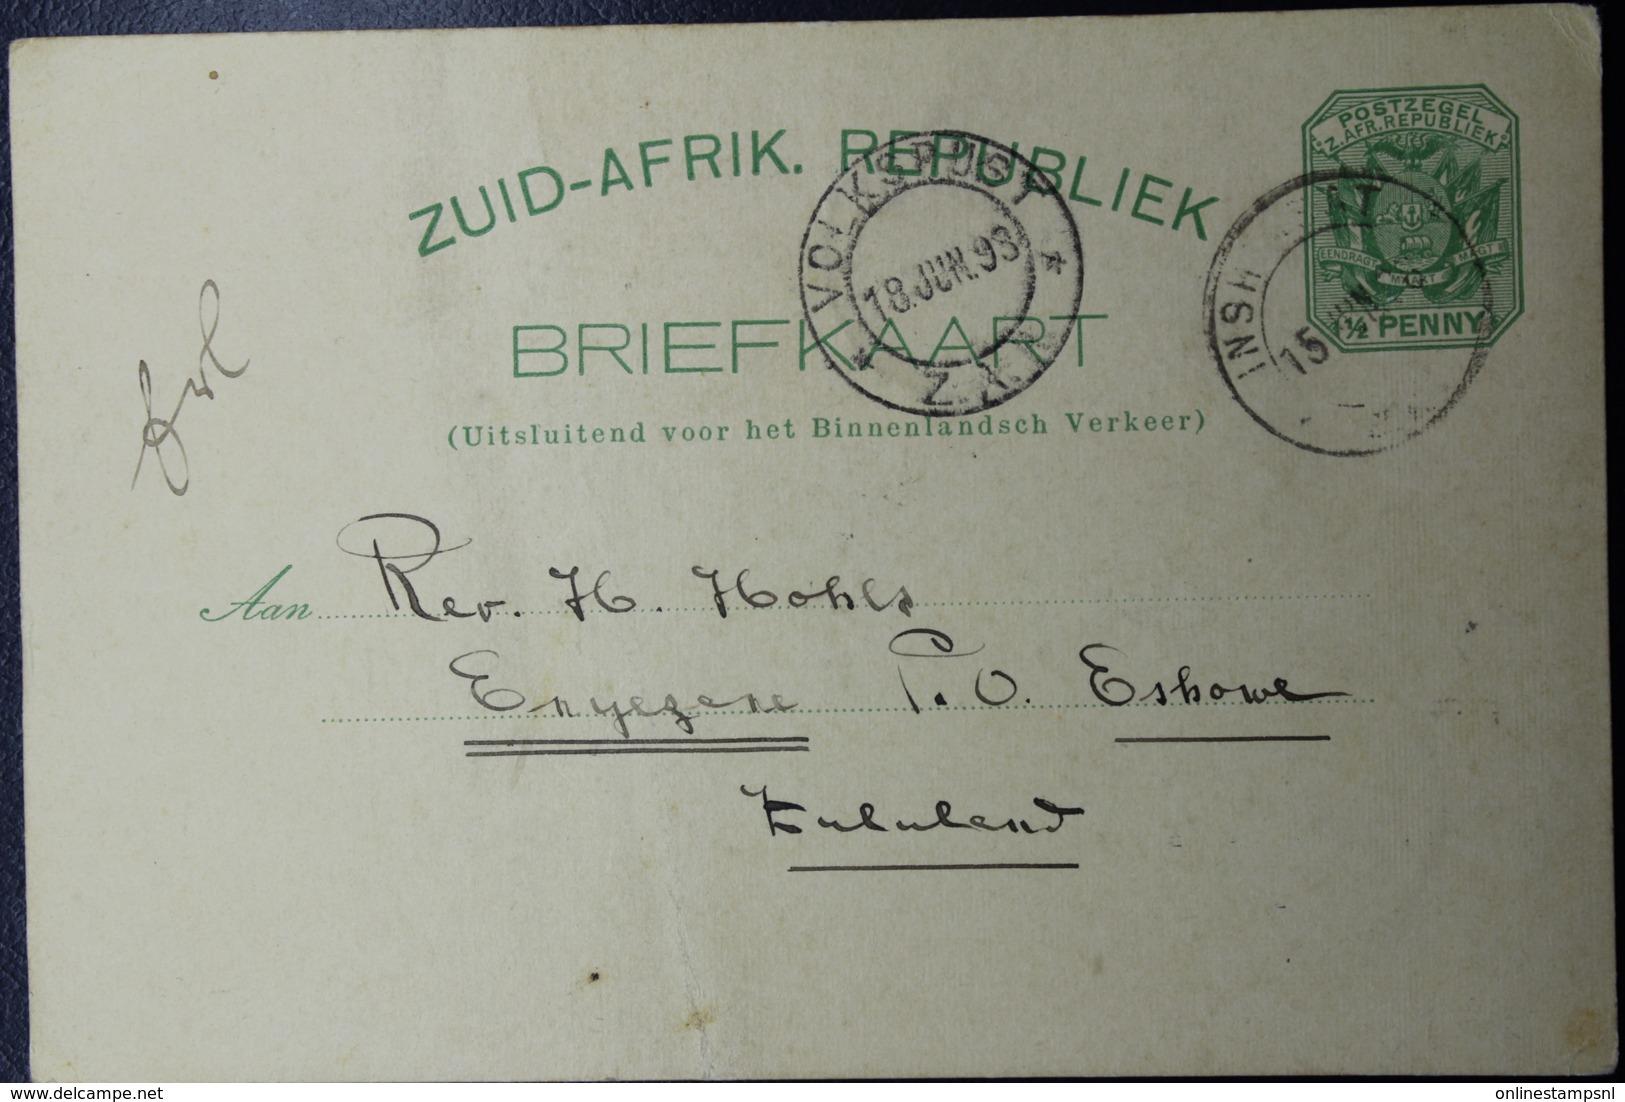 Transvaal Postcard P5  INSHLASJOTJE -> ENYZEZENE  Putzel RRR - Transvaal (1870-1909)